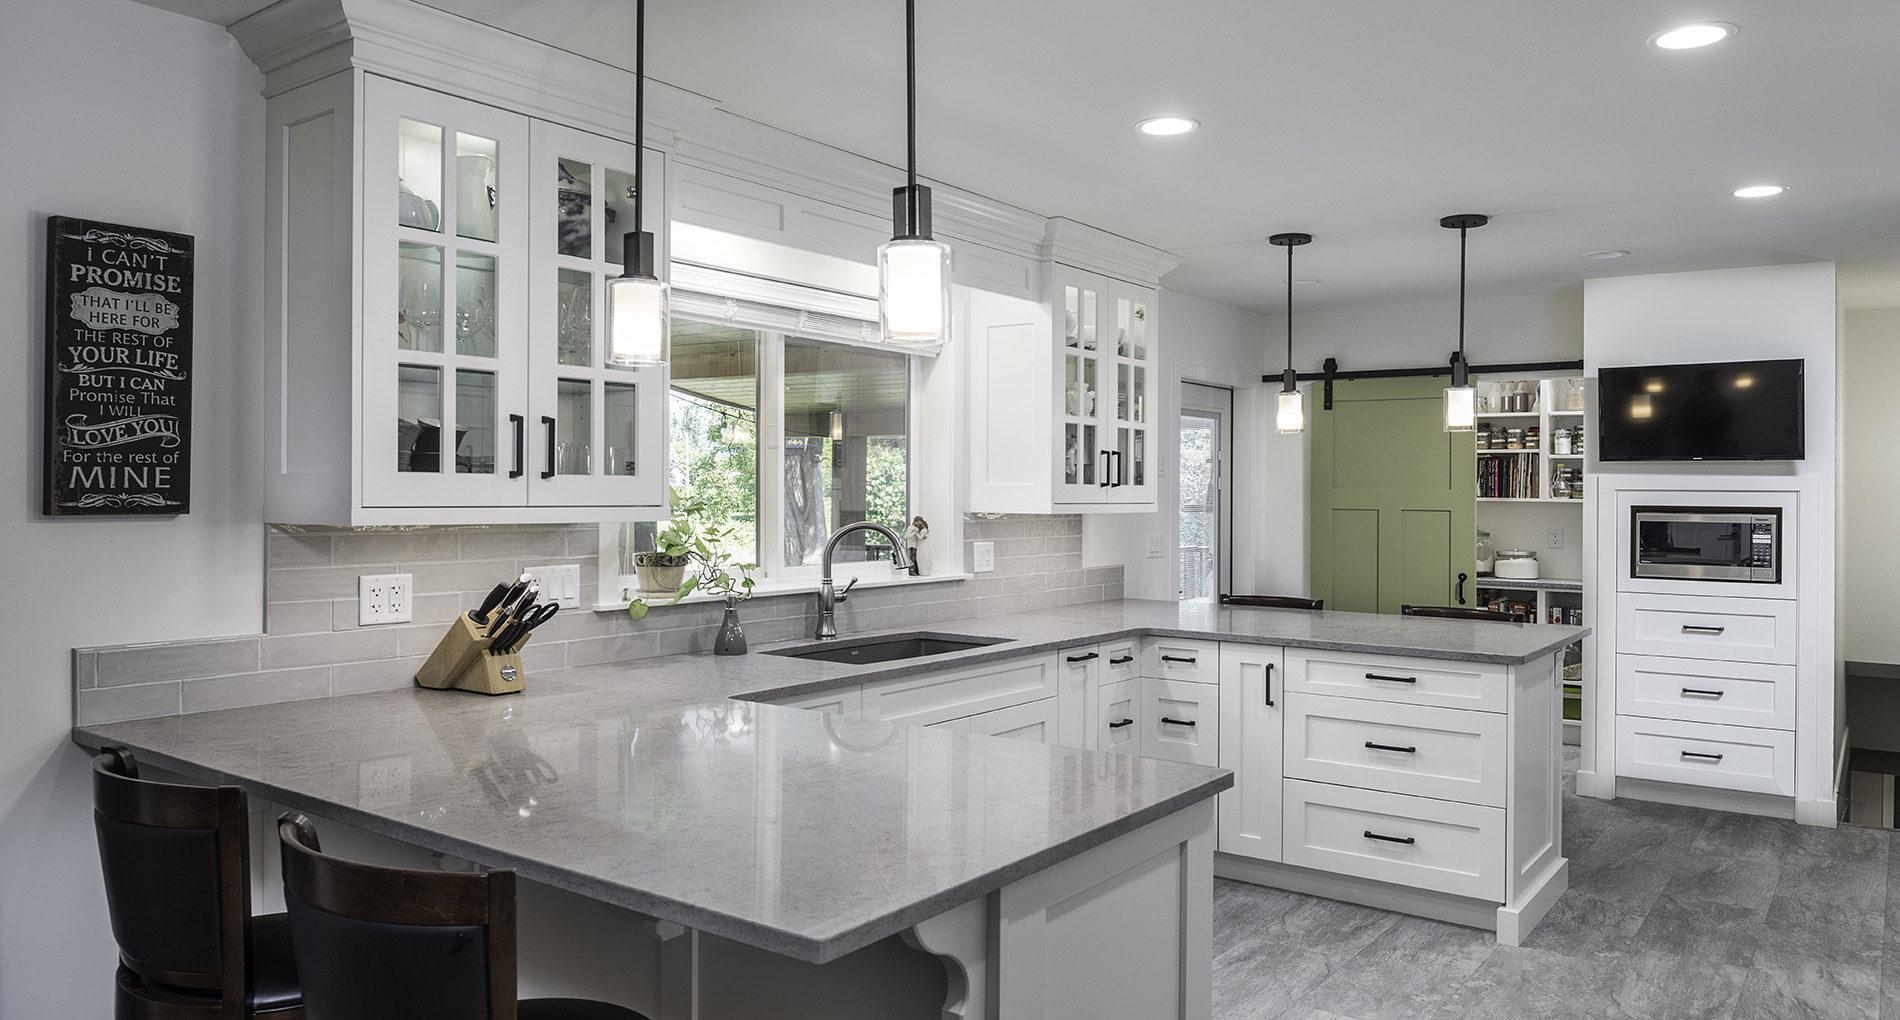 Kitchen Renovation Mapleridge Inglewoodcrescent Slider